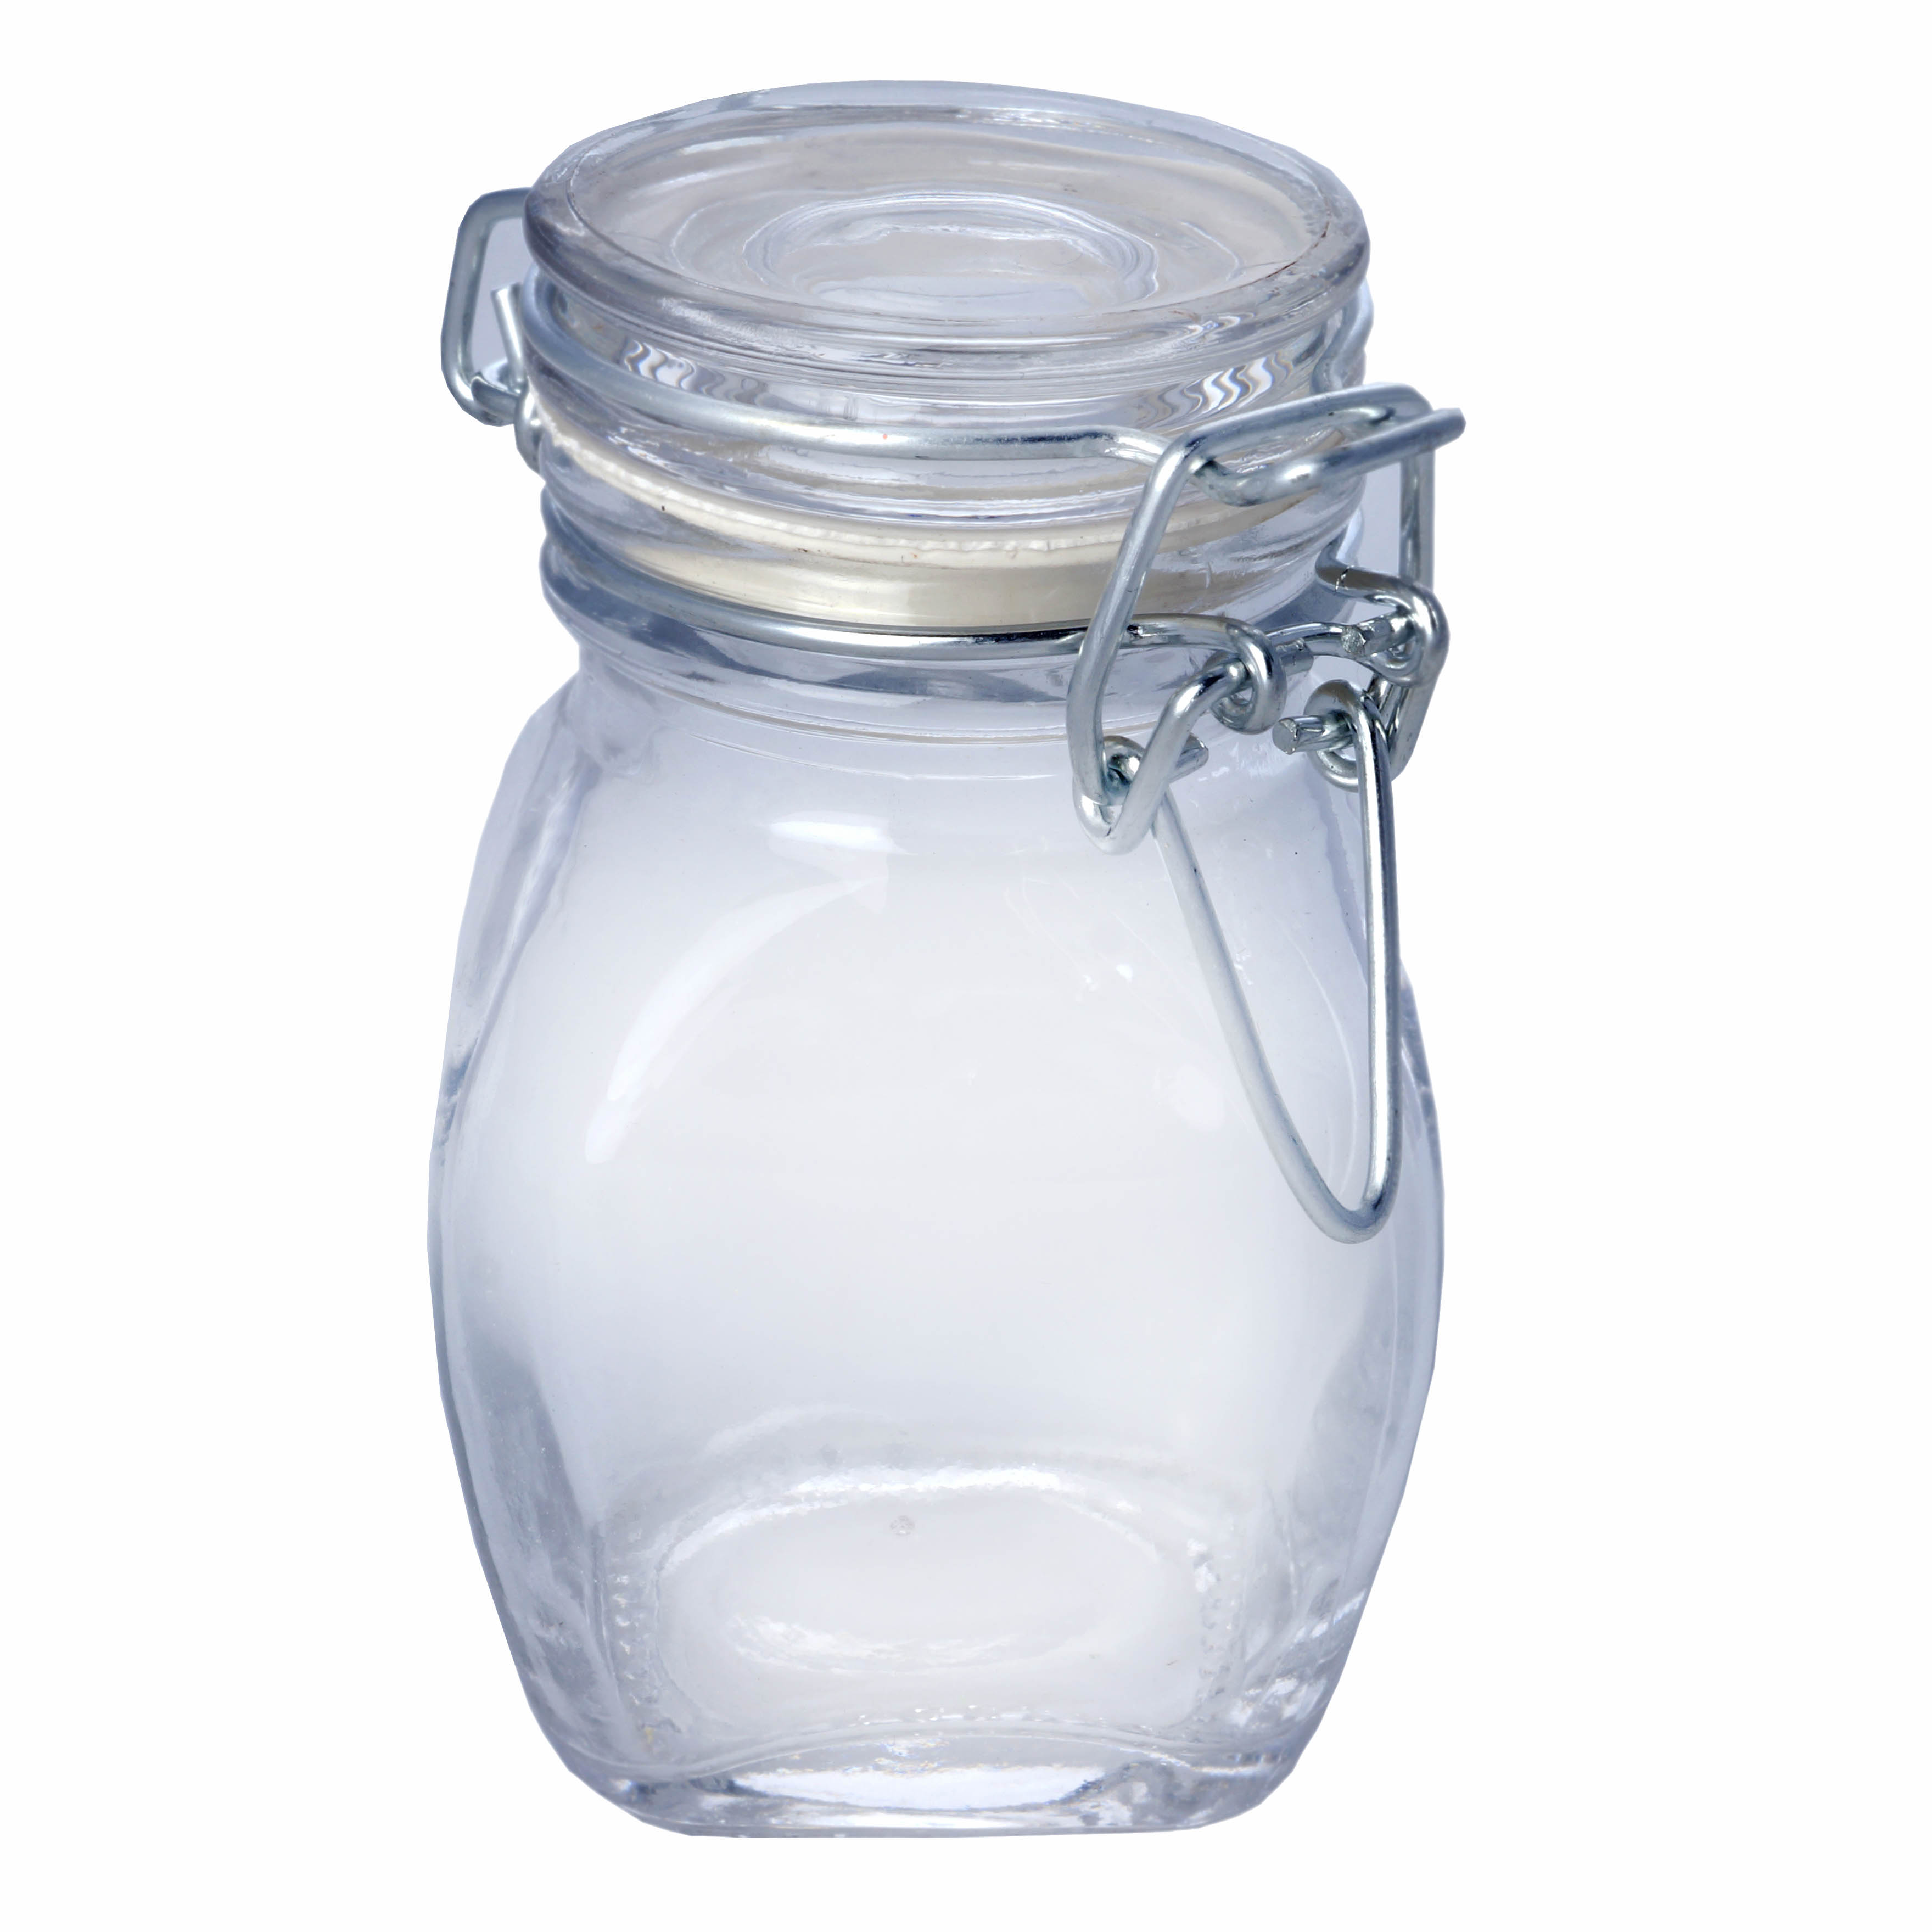 clear 4 oz glass mini jars bottles favors wedding party holders wholesale bulk ebay. Black Bedroom Furniture Sets. Home Design Ideas